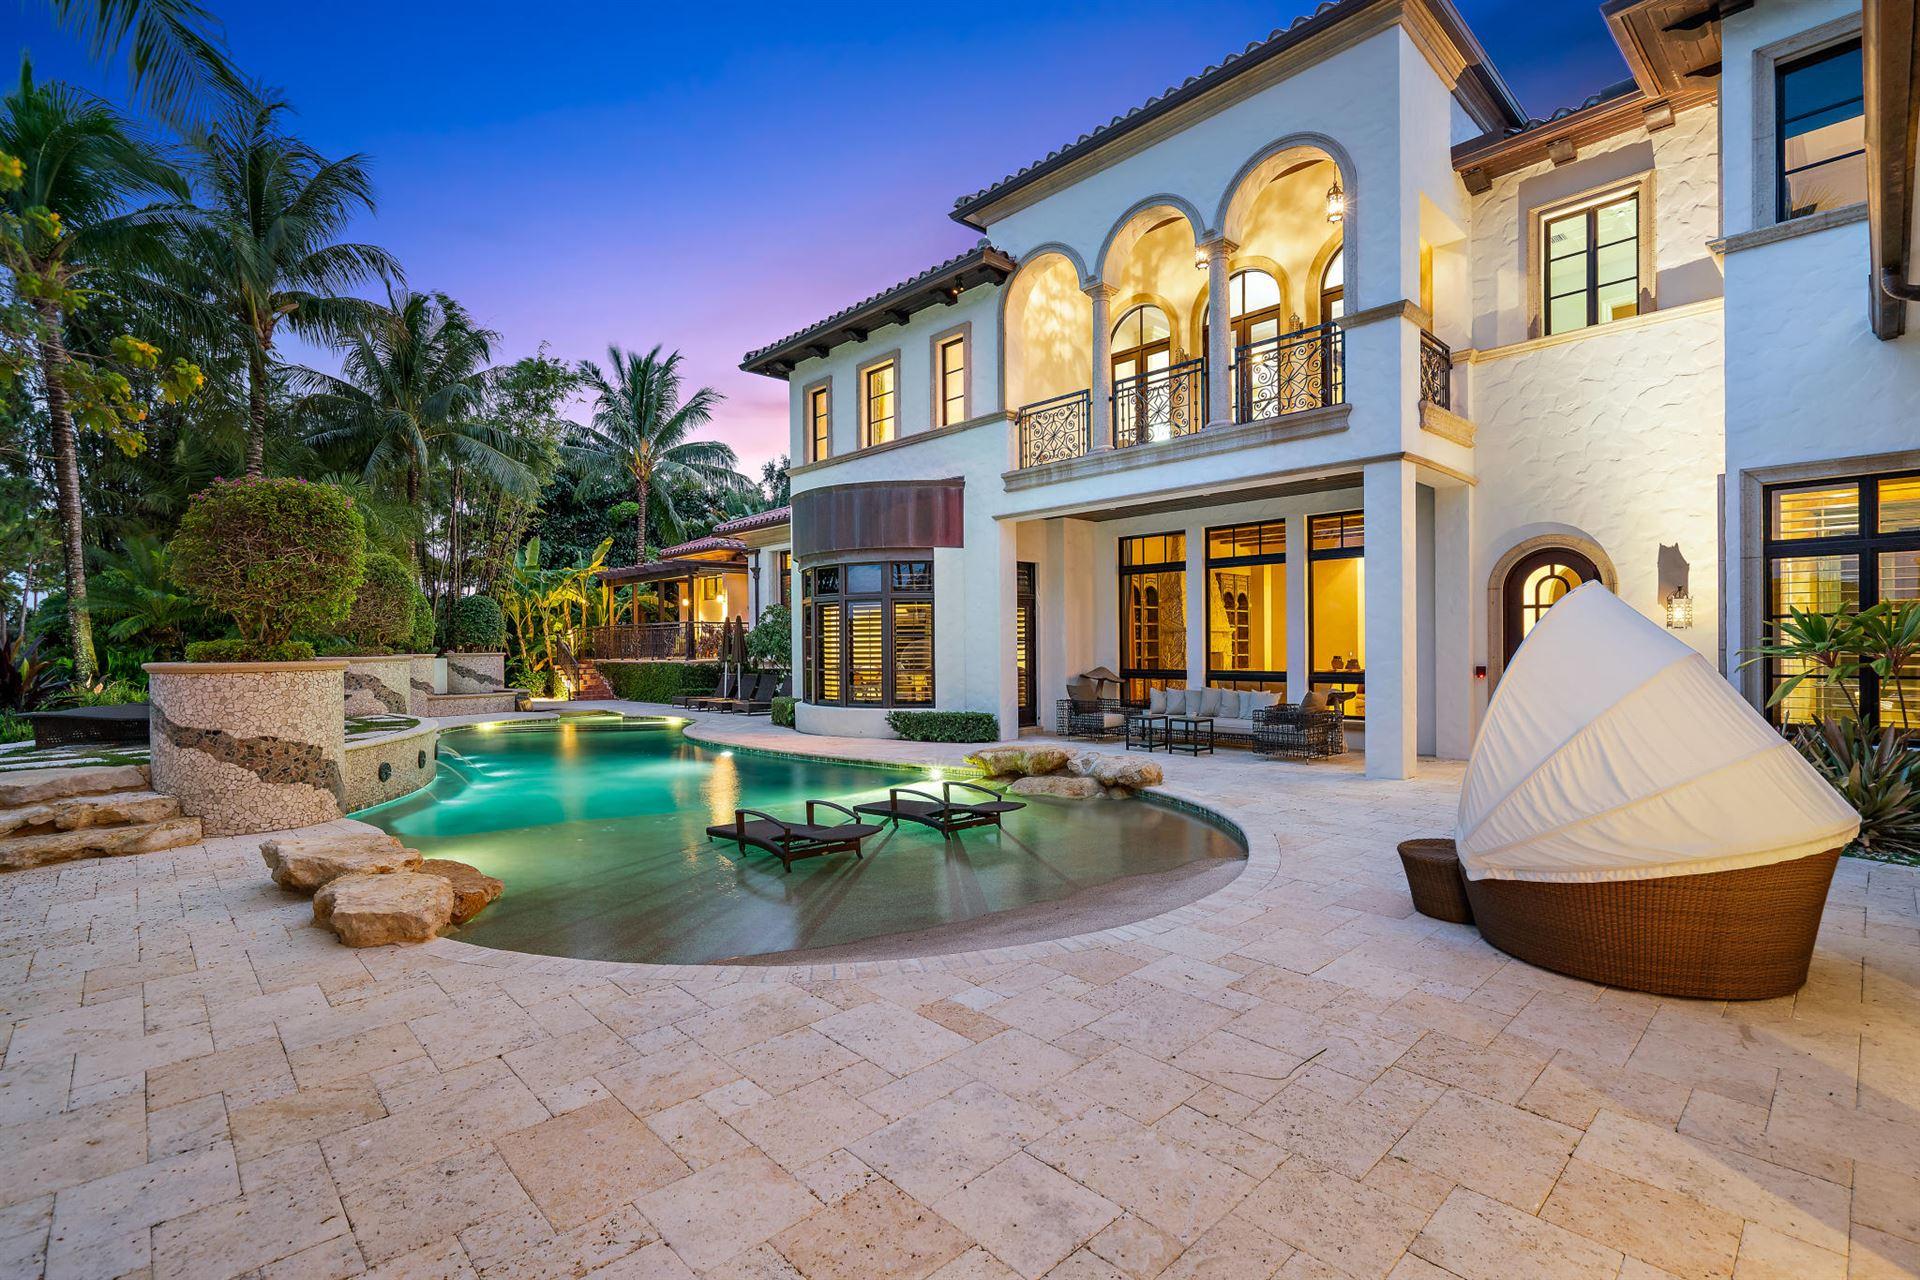 Photo of 11759 Elina Court, Palm Beach Gardens, FL 33418 (MLS # RX-10667156)